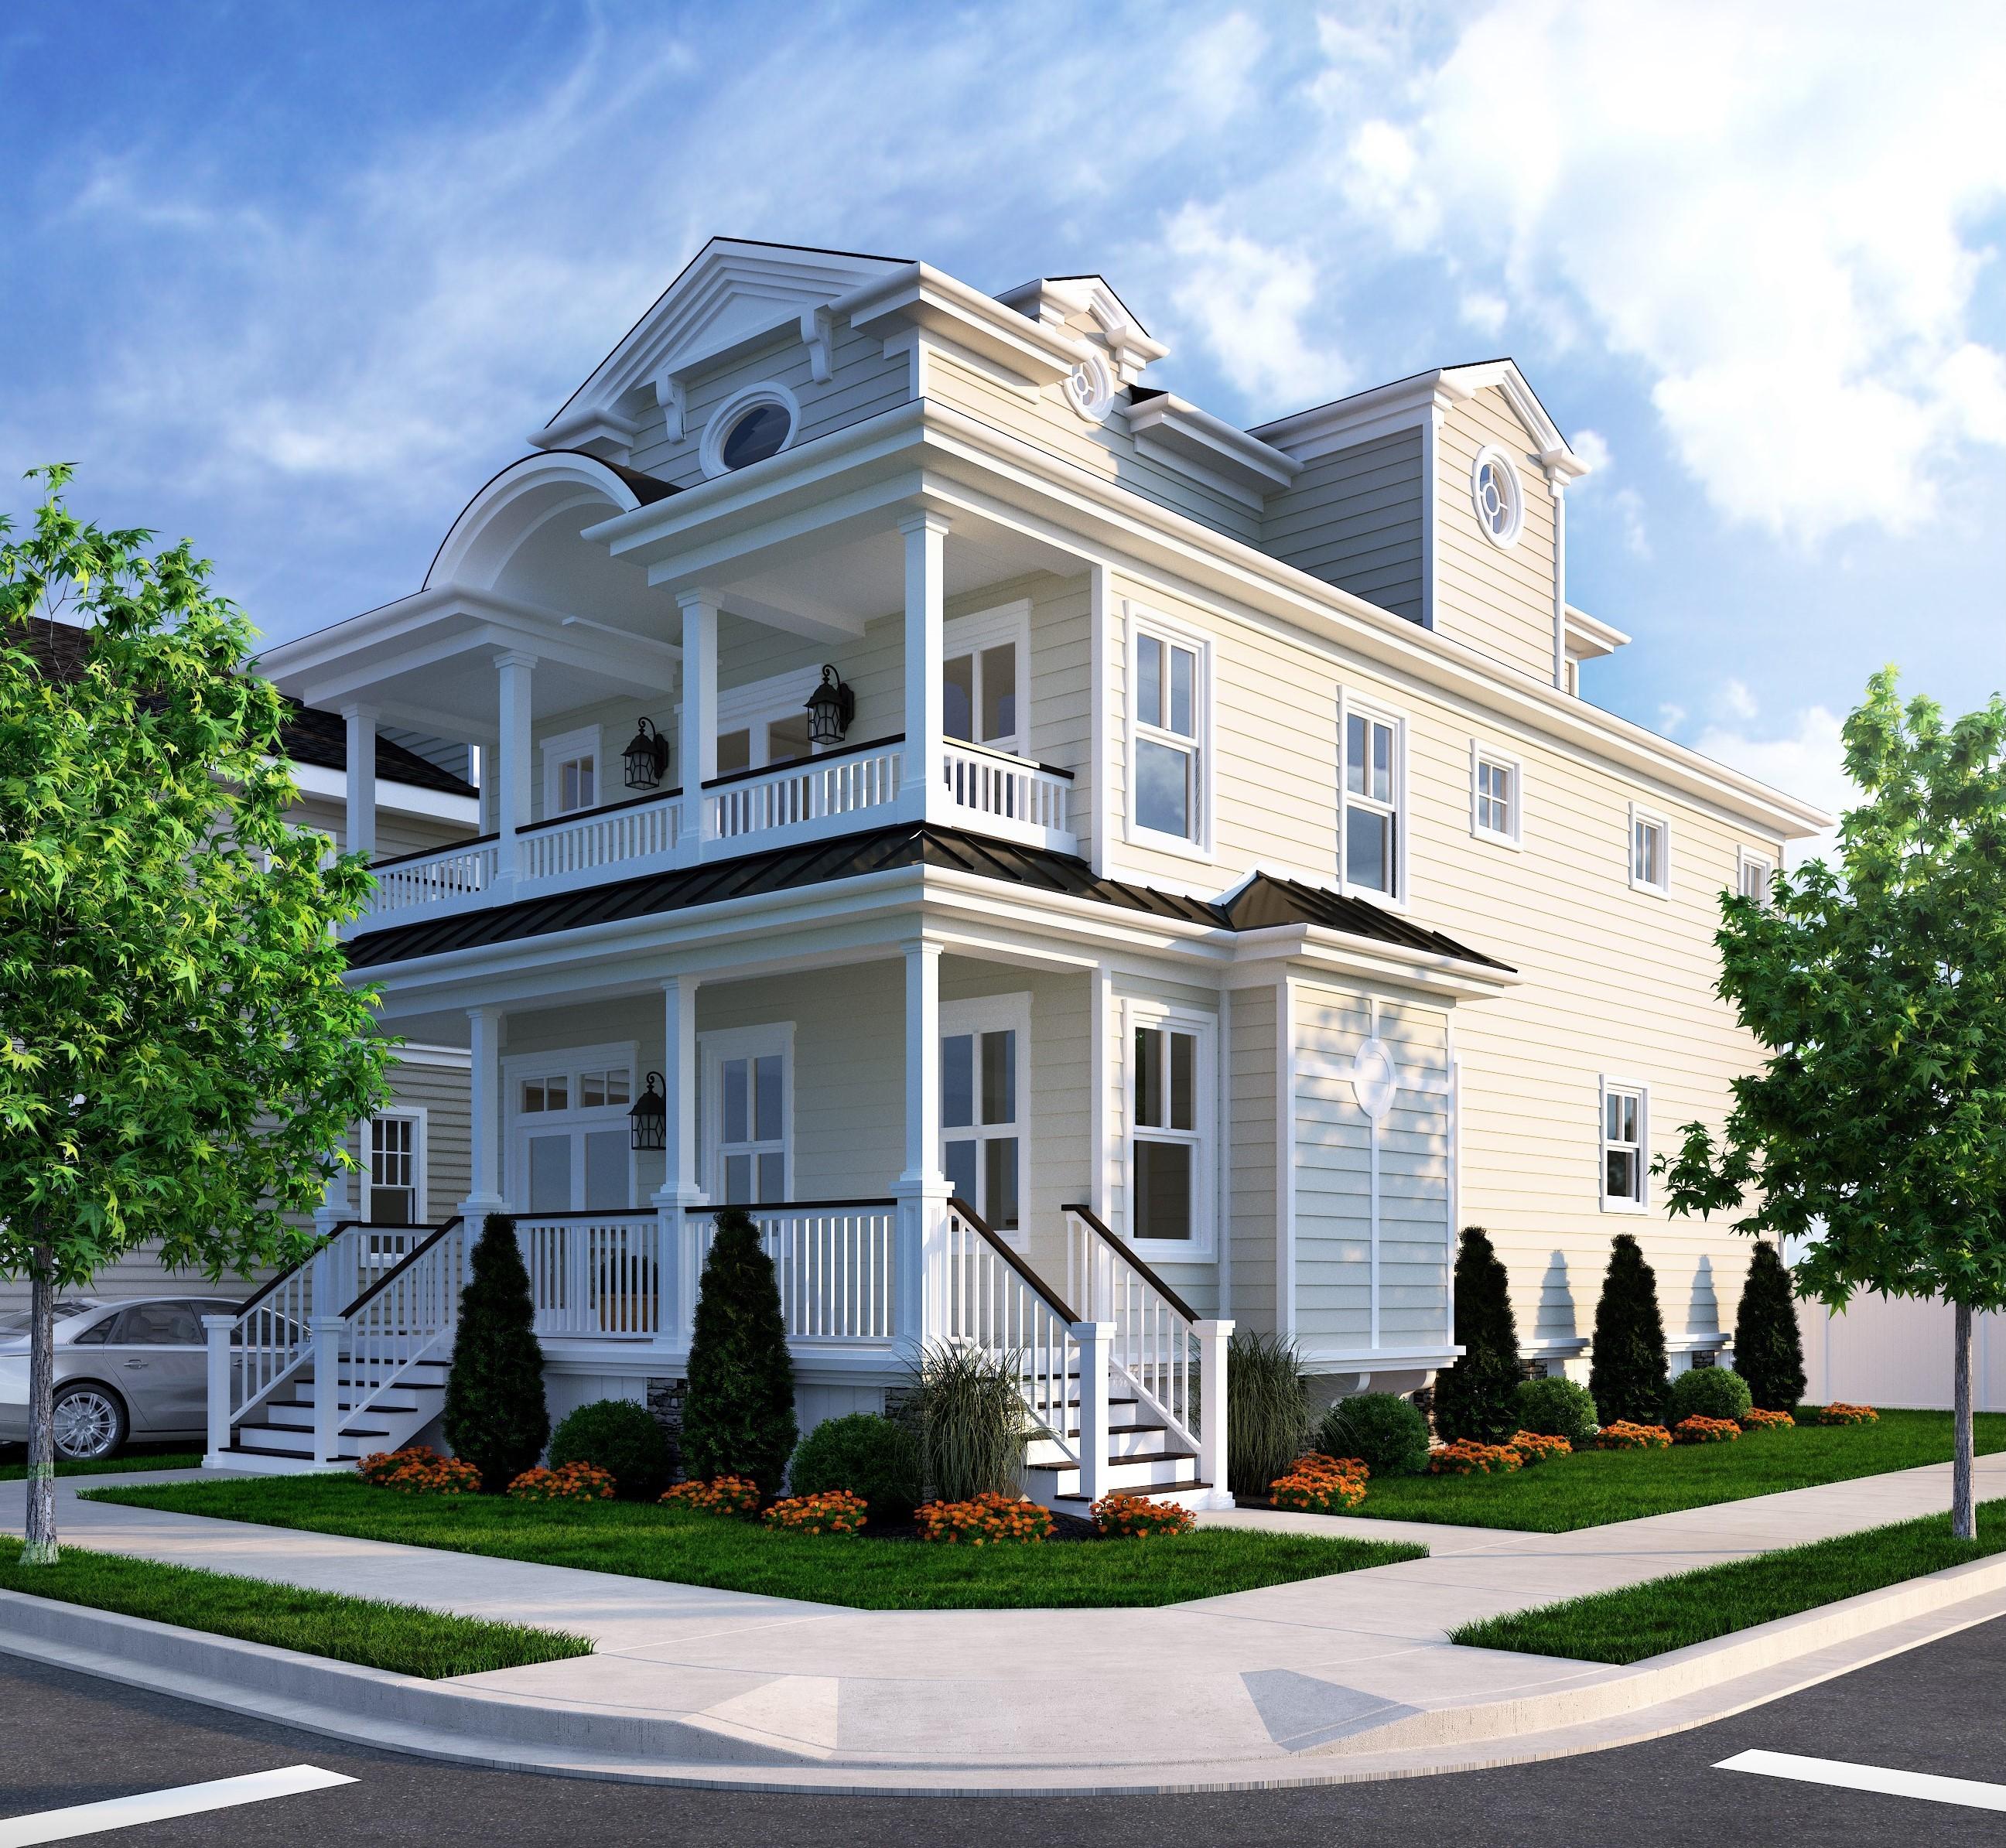 Single Family Home for Sale at 7600 Ventnor Avenue 2 A S Brunswick Ave 7600 Ventnor Margate, New Jersey, 08402 United States